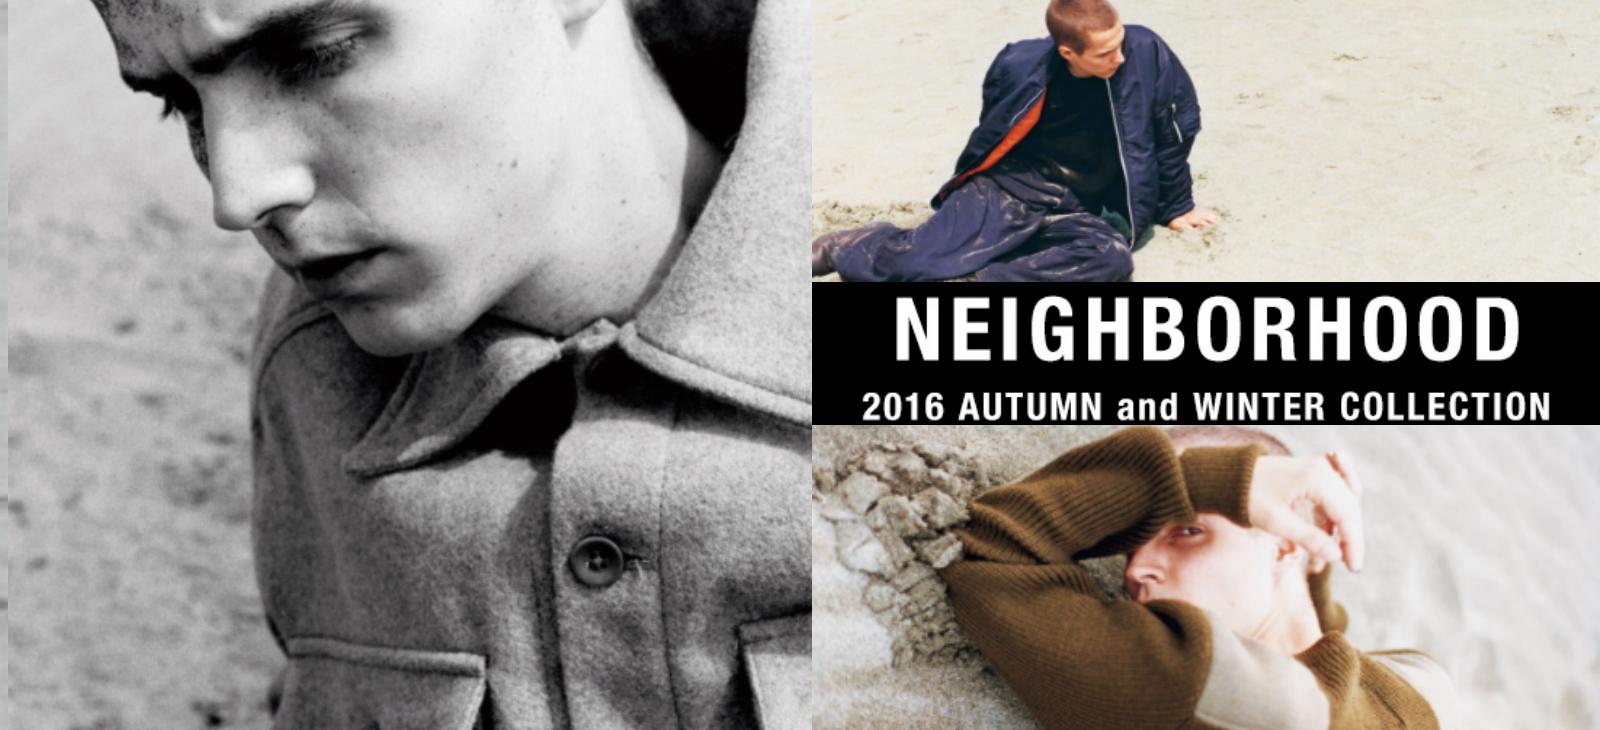 NEIGHBORHOOD 2016a&aメイン 1